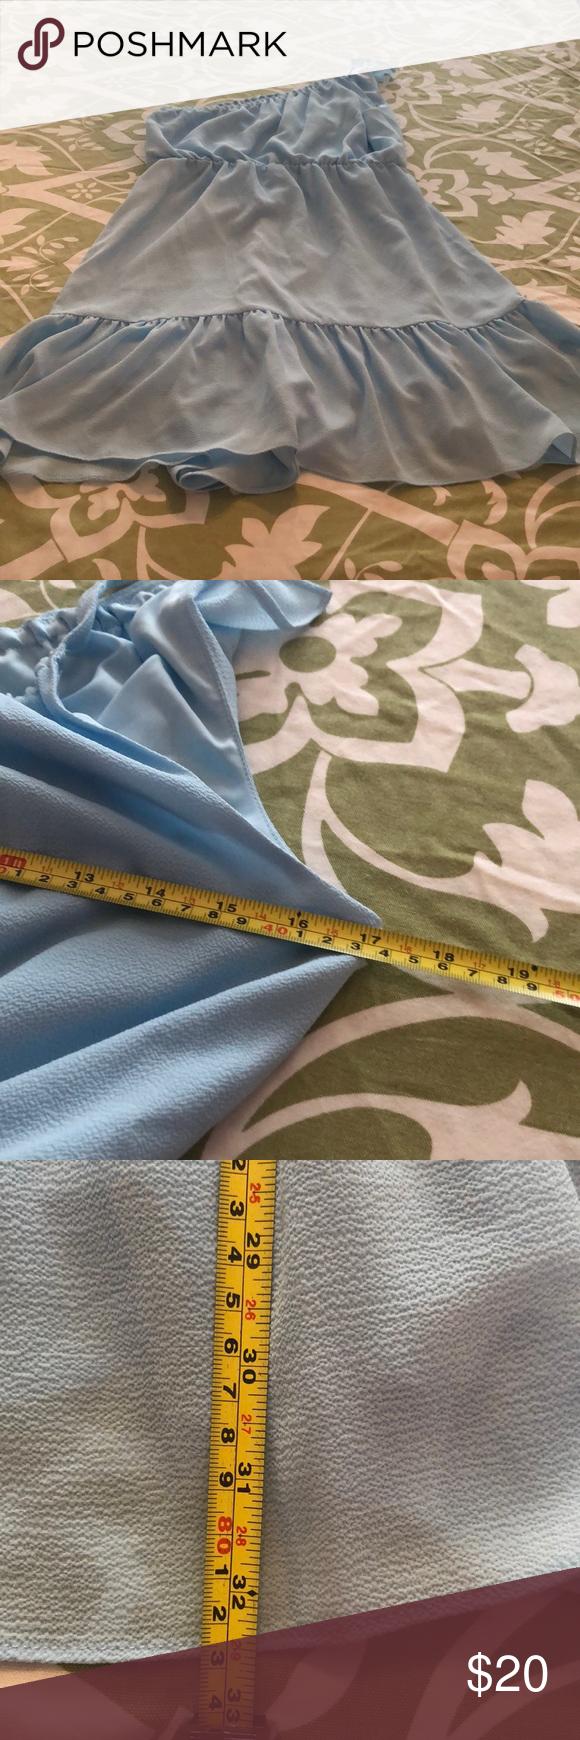 Kaari Blue Petite Dress Petite Dresses Clothes Design Dress First [ 1740 x 580 Pixel ]